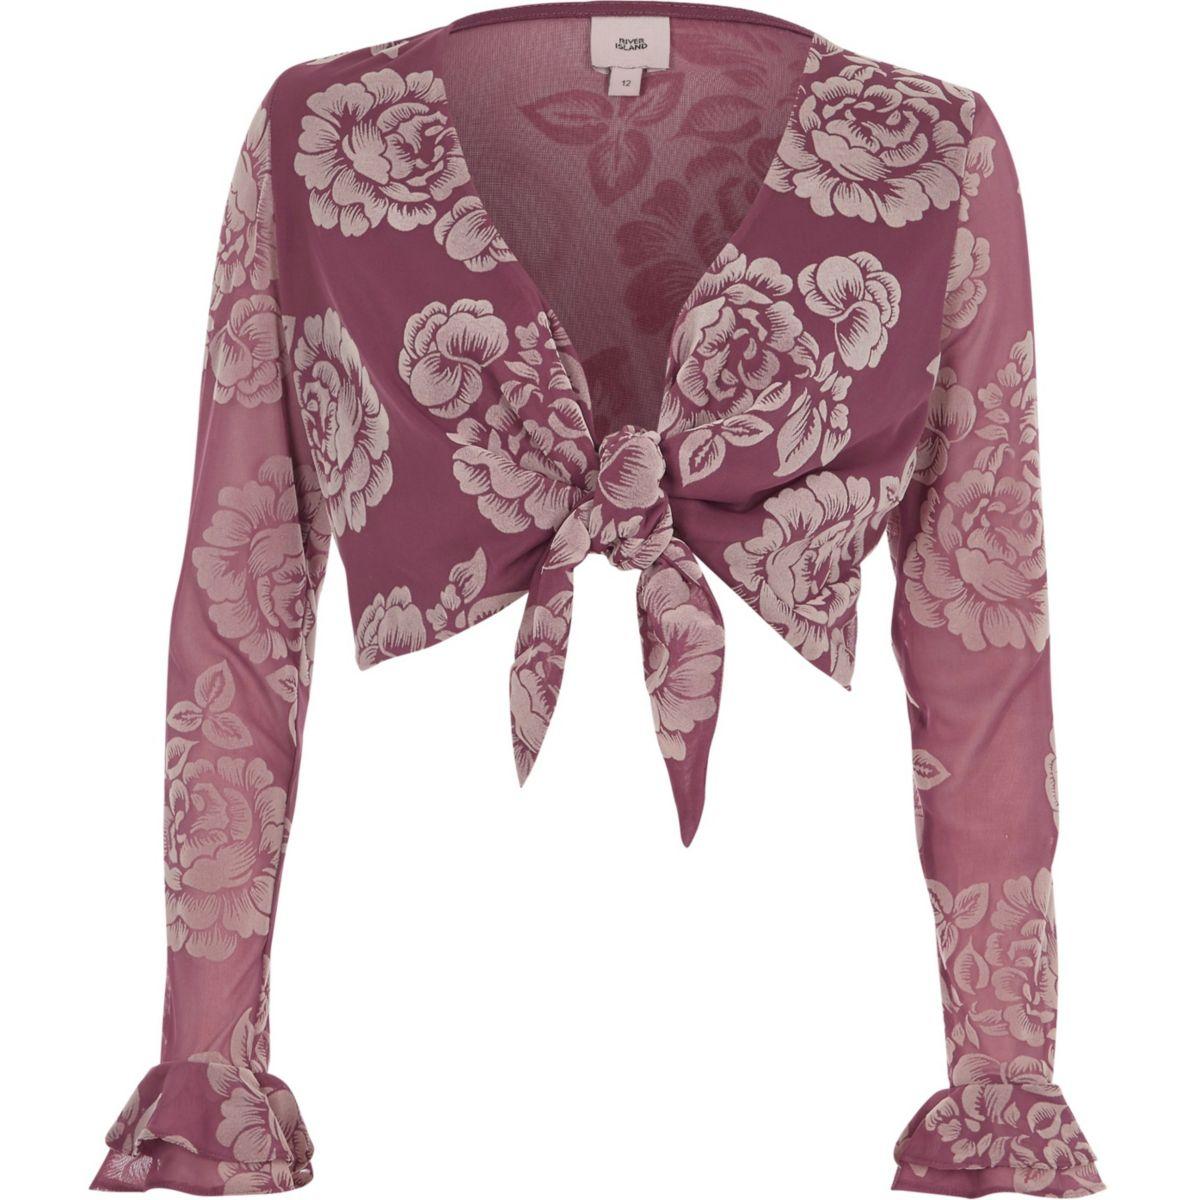 Pink floral flocked knot front crop top